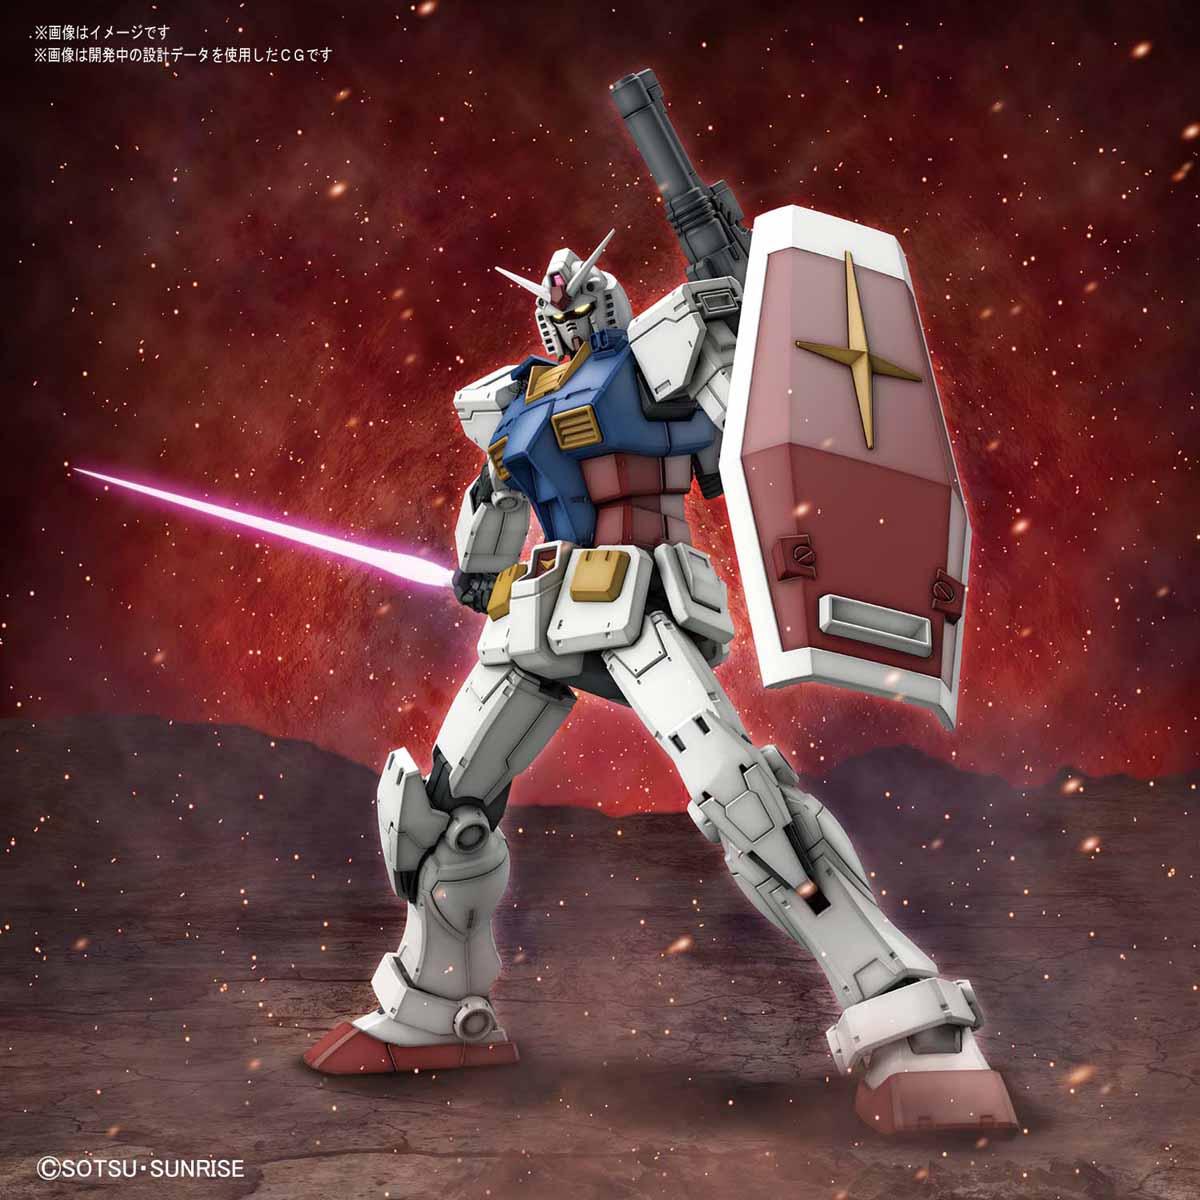 HG 1/144『RX-78-02 ガンダム(GUNDAM THE ORIGIN版)』プラモデル-001